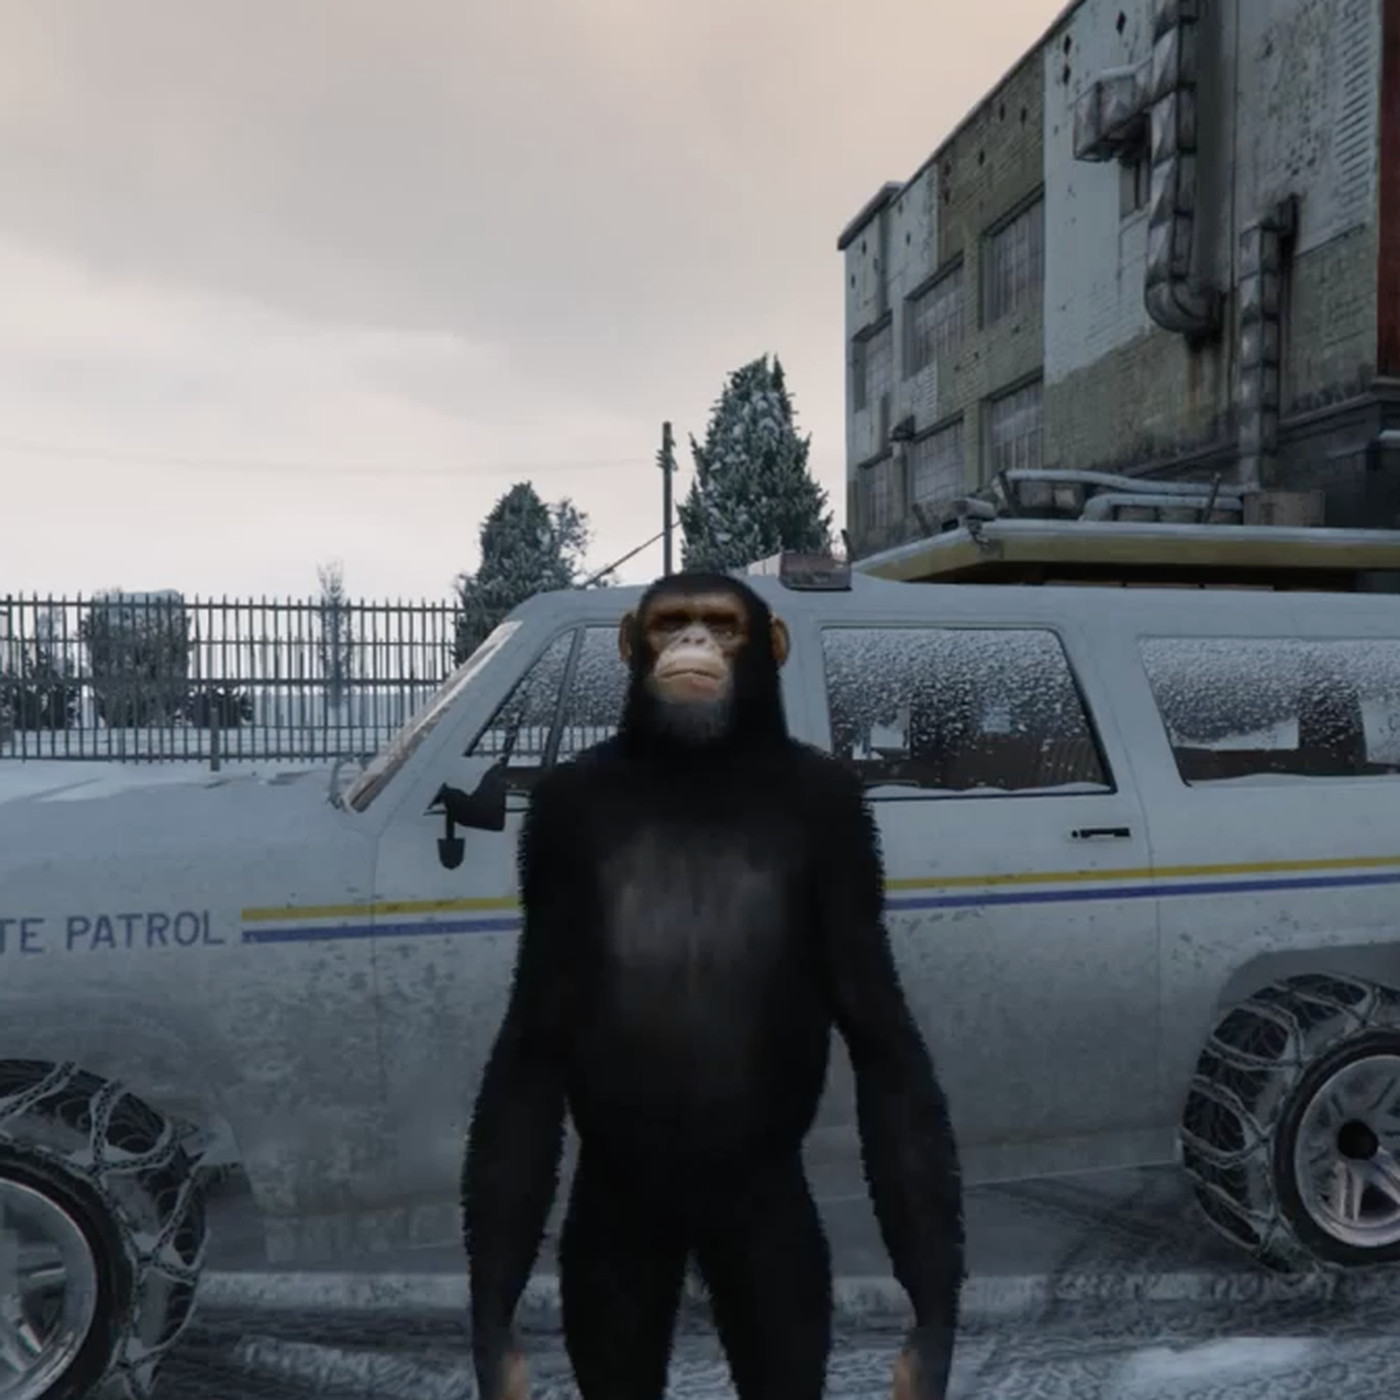 GTA 5 mod lets you explore a hidden, snowy ghost town - Polygon